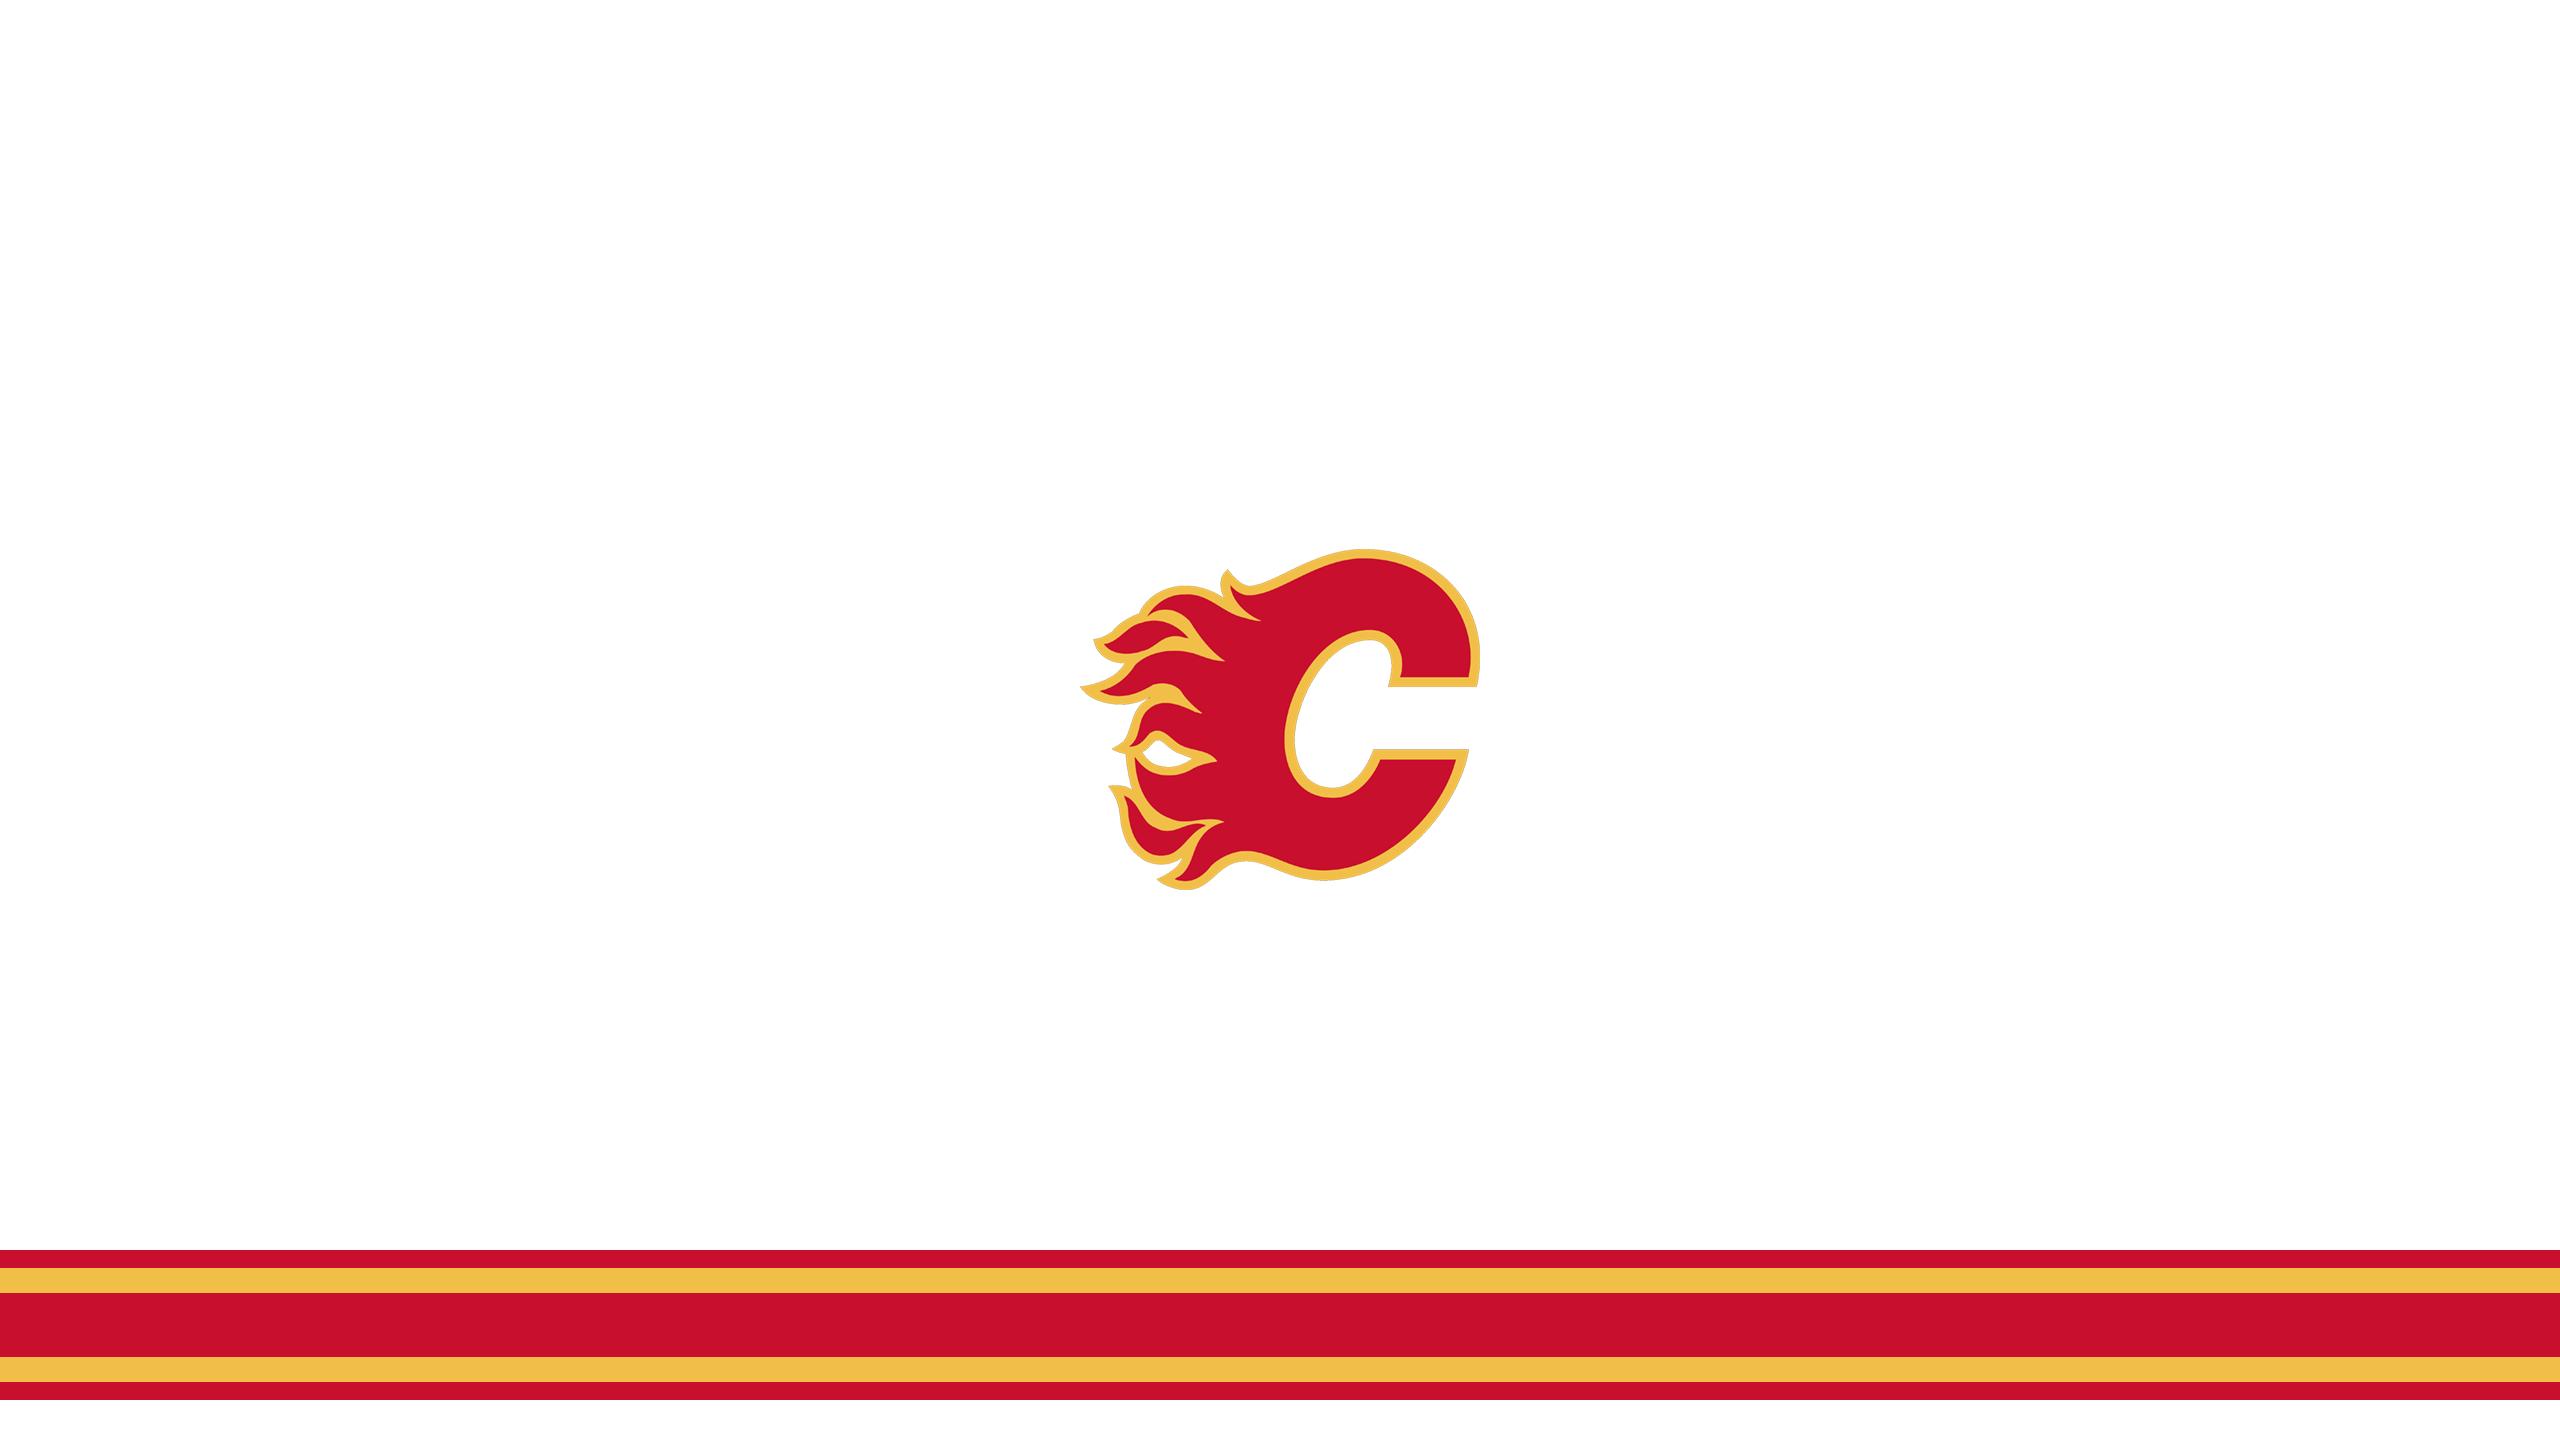 Calgary Flames (Away)